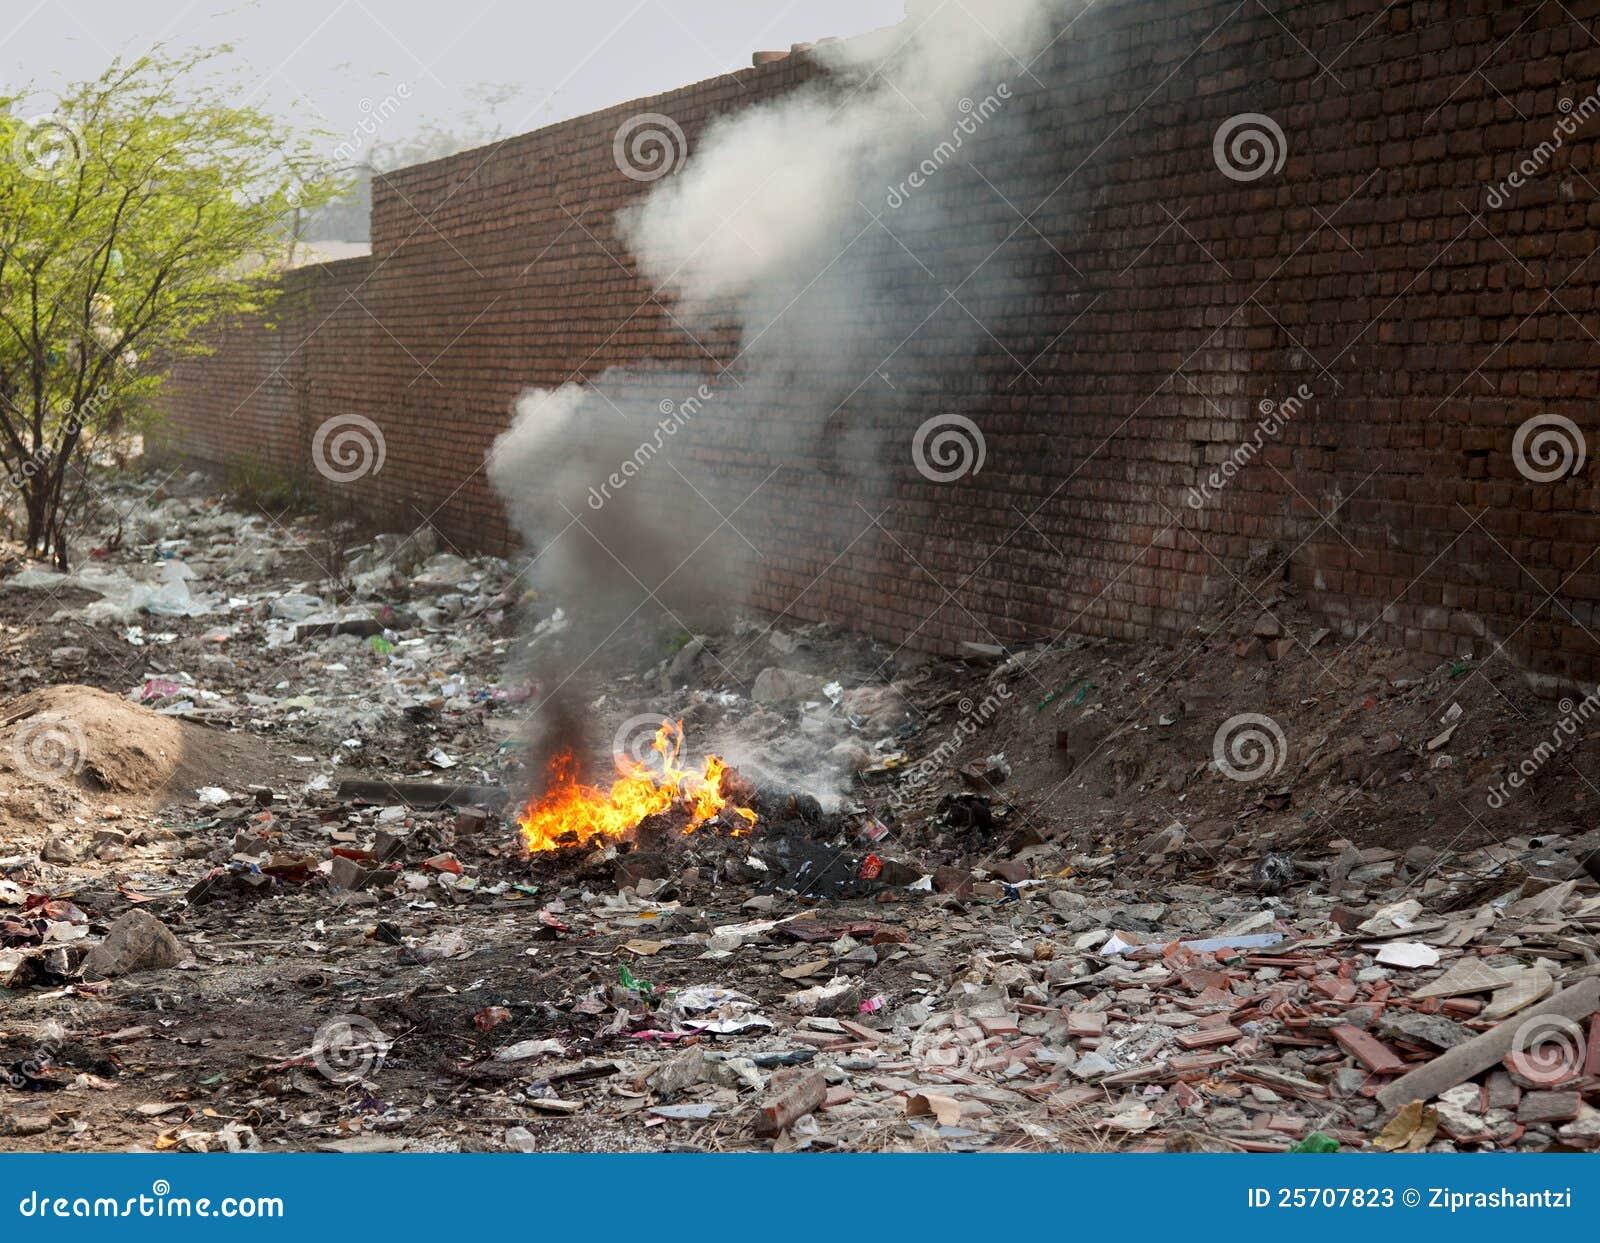 war pollution essay